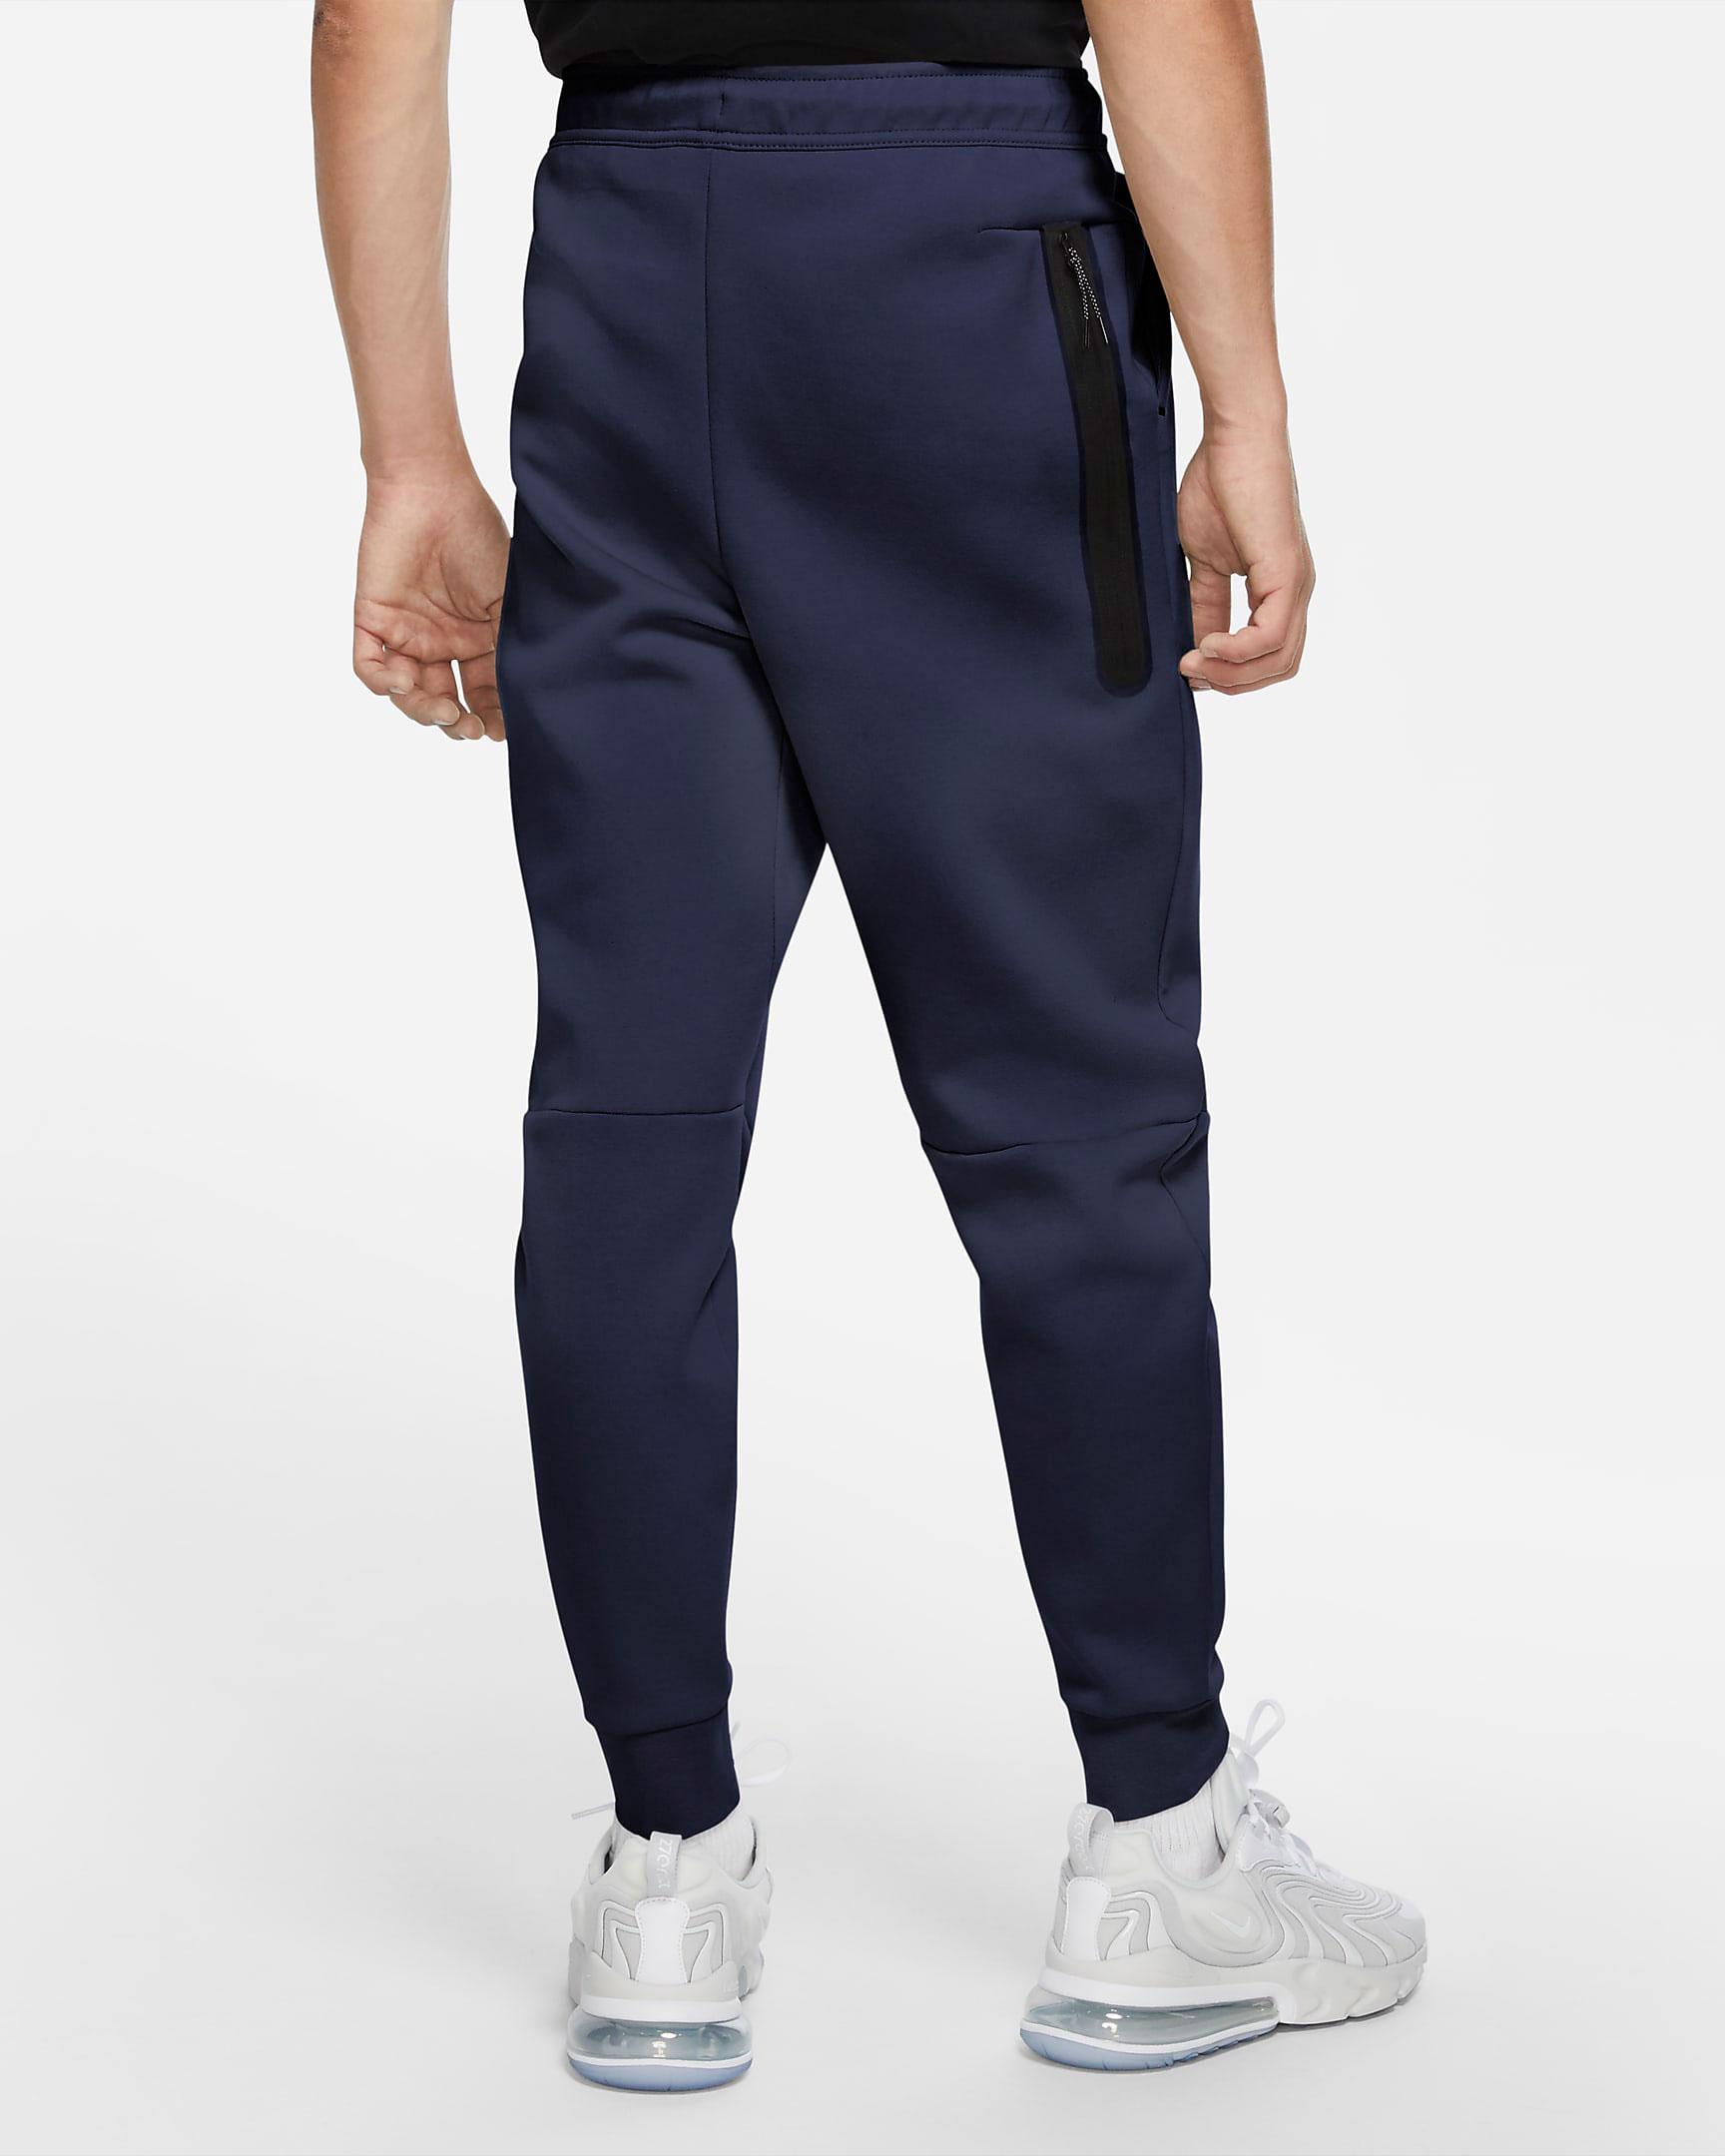 jordan-1-midnight-navy-nike-tech-fleece-pants-2